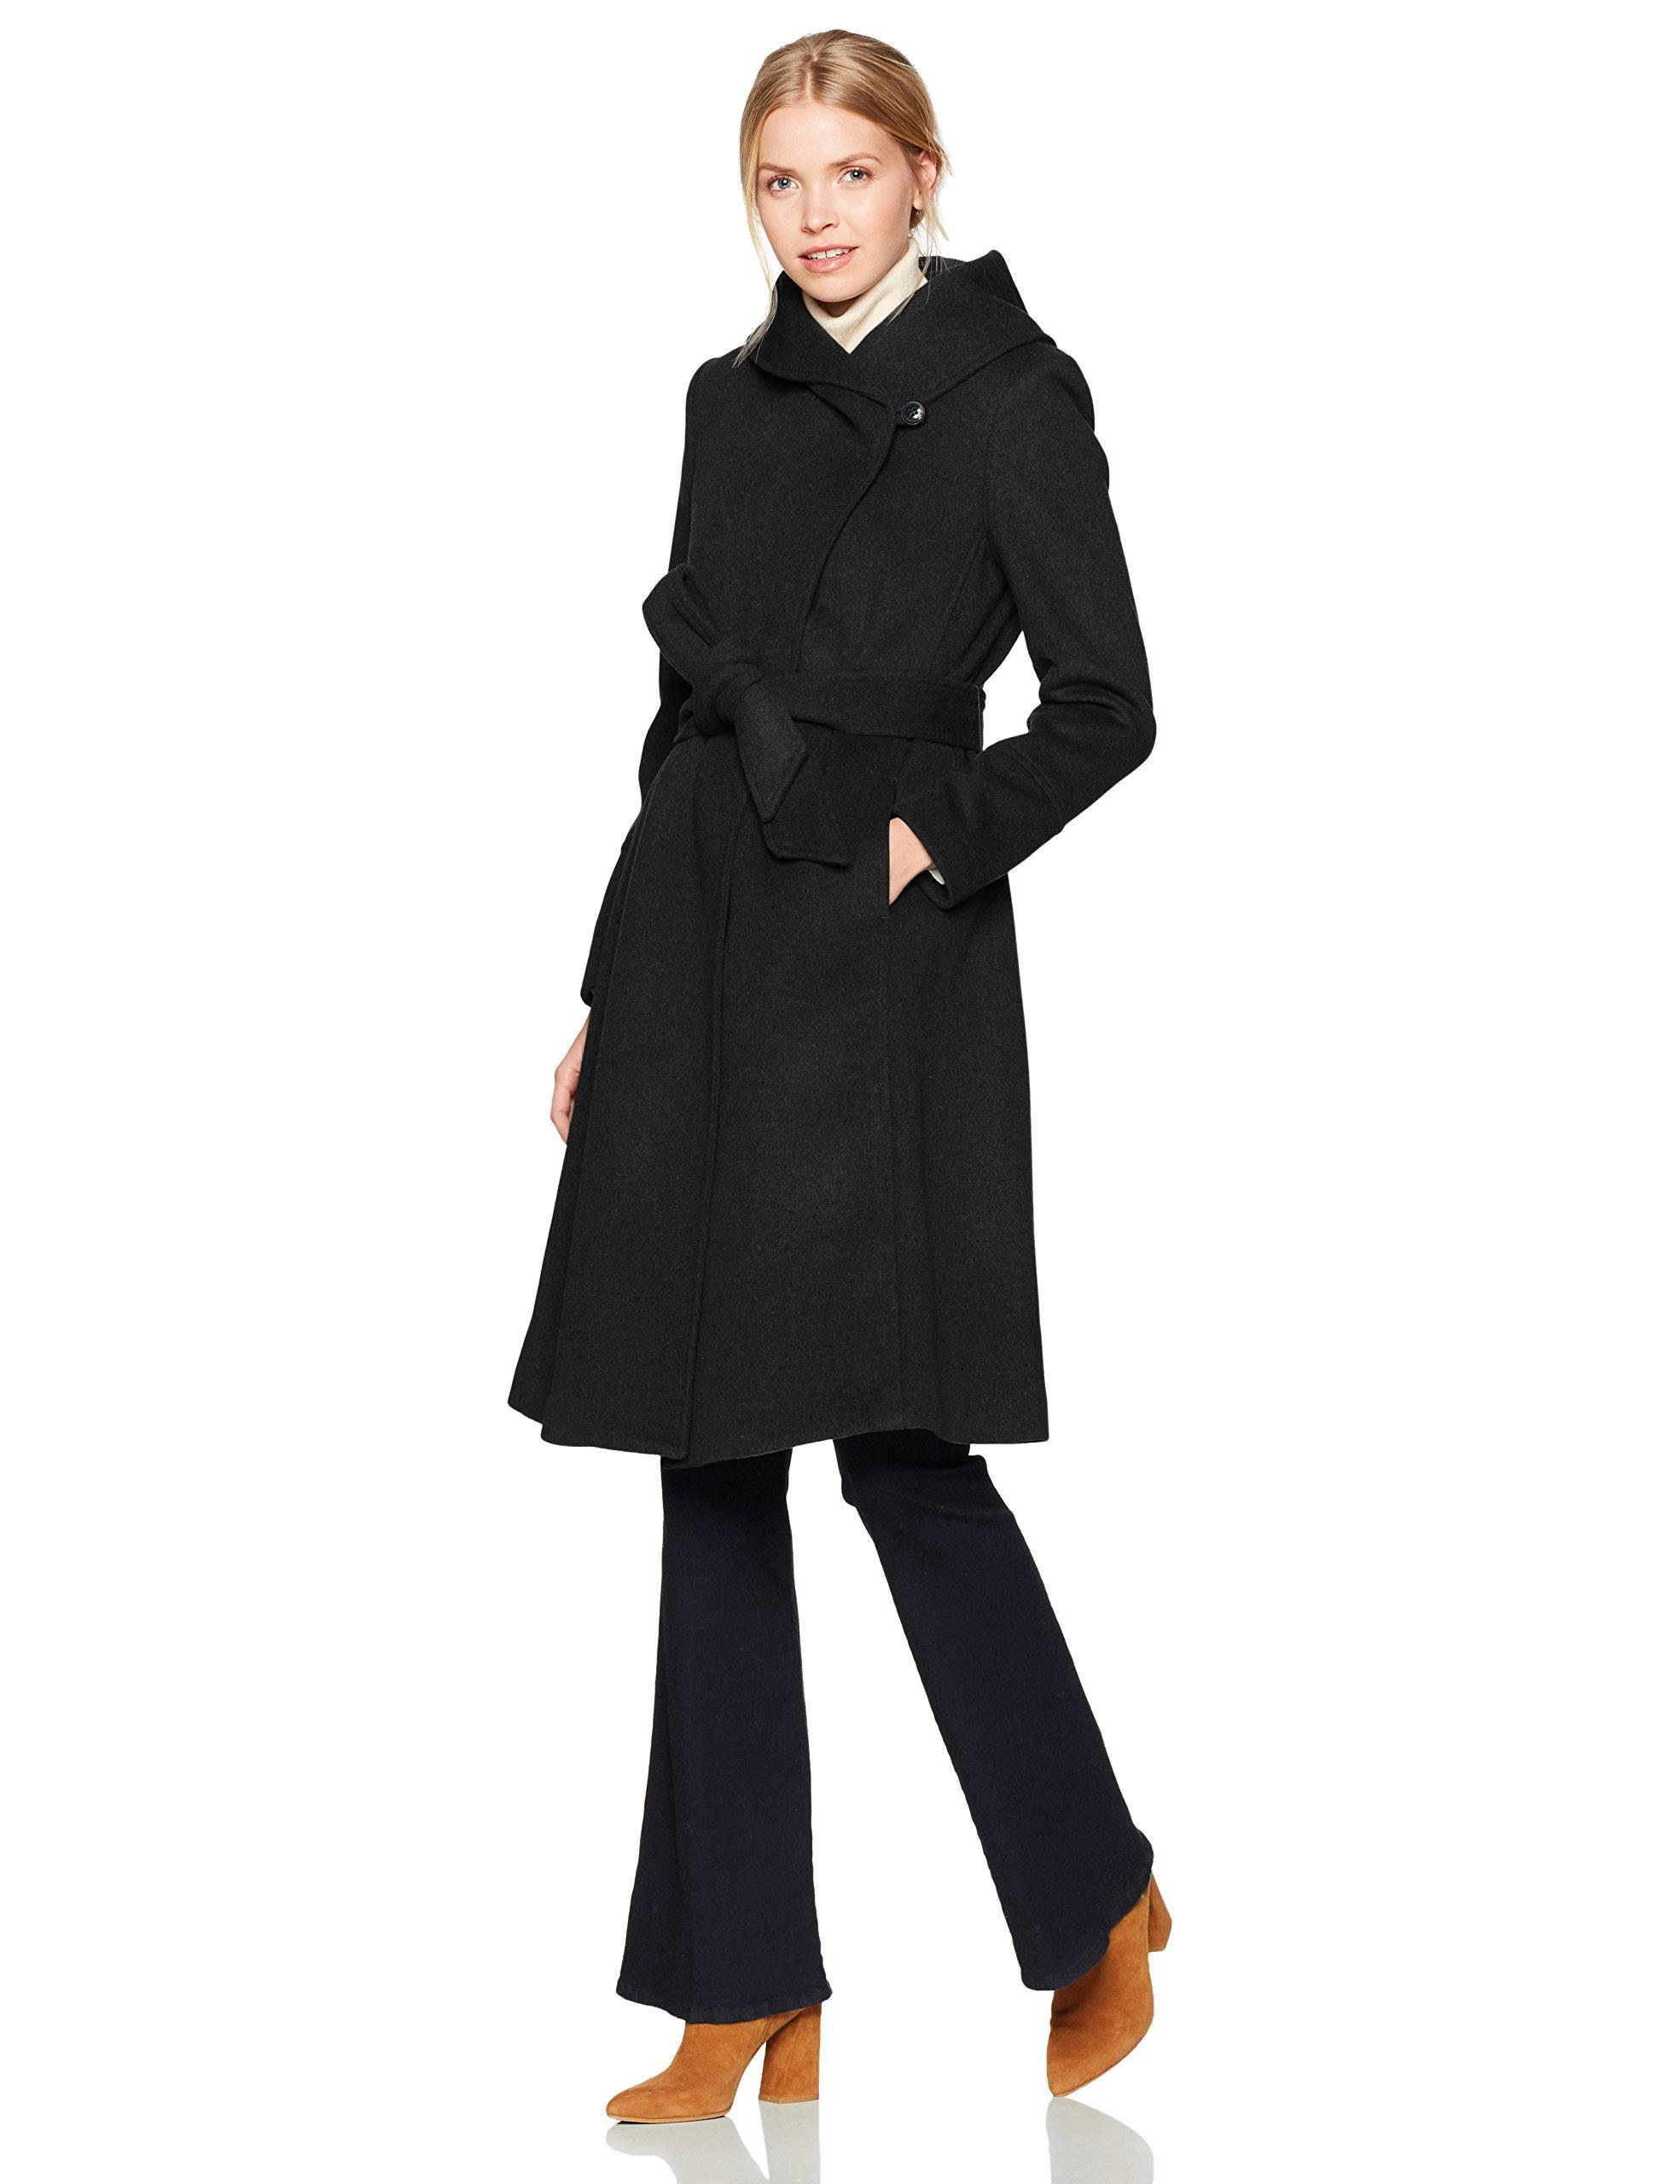 Cole Haan Women's Luxury Wool Asymmetrical Coat with Oversized Shawl Collar, Black, 4